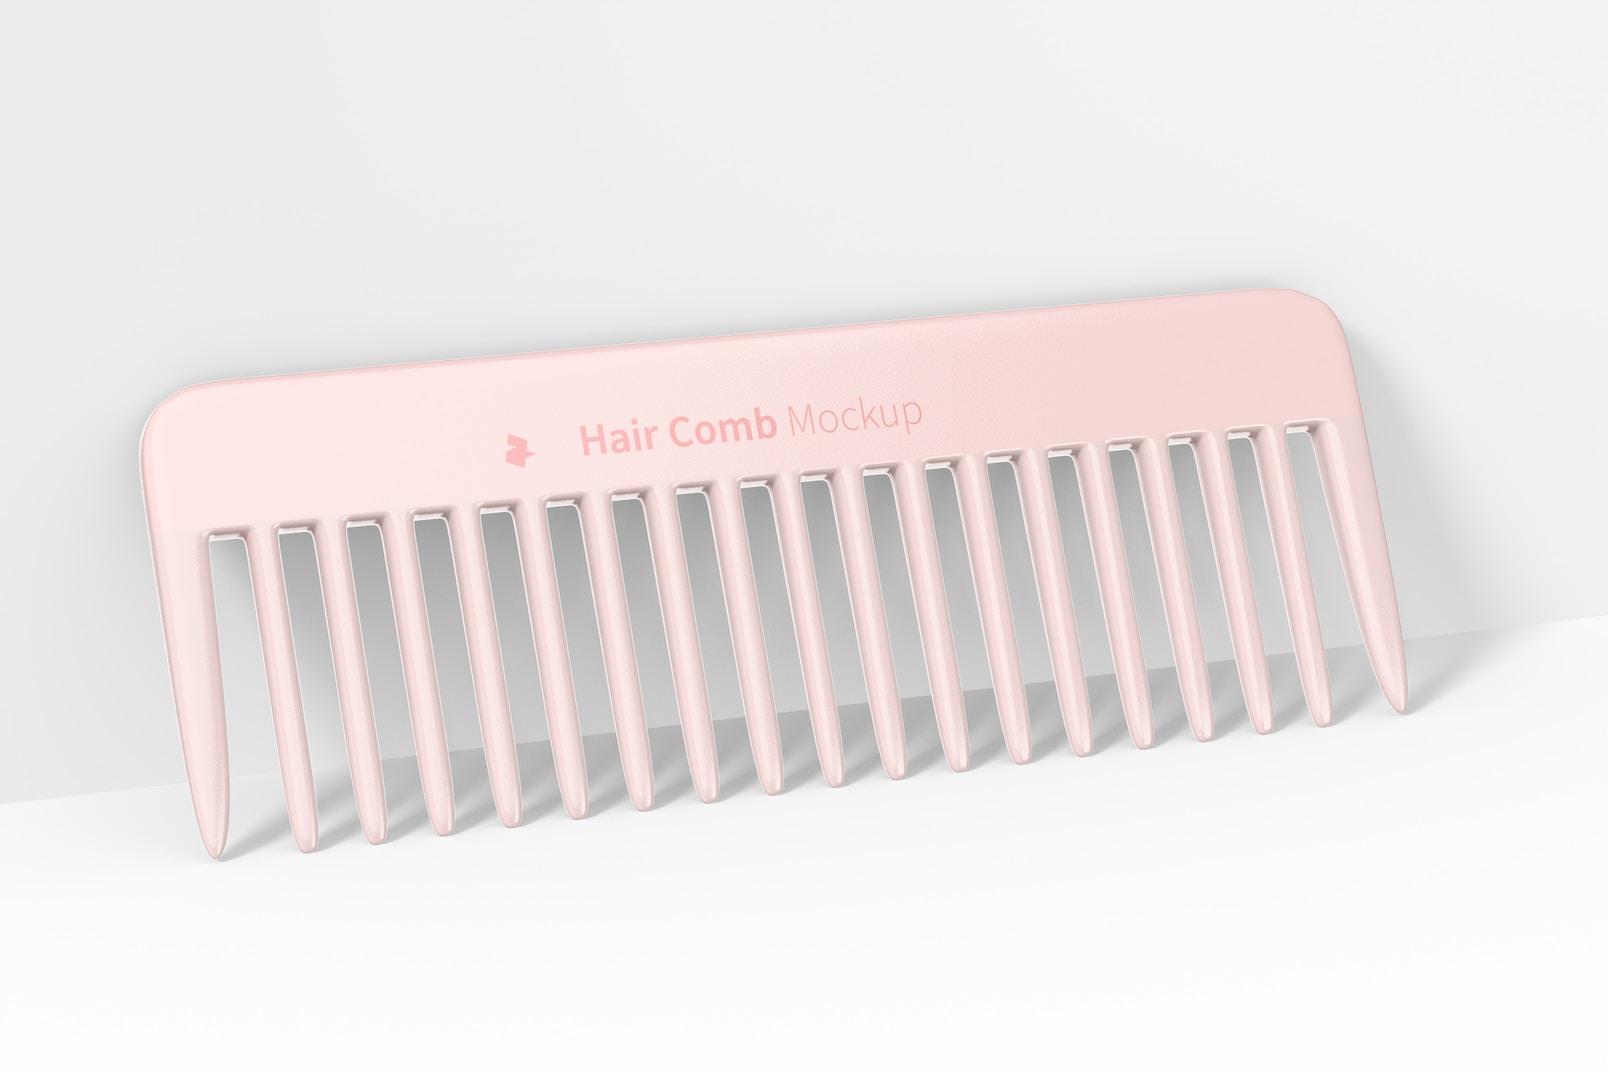 Hair Comb Mockup, Leaned